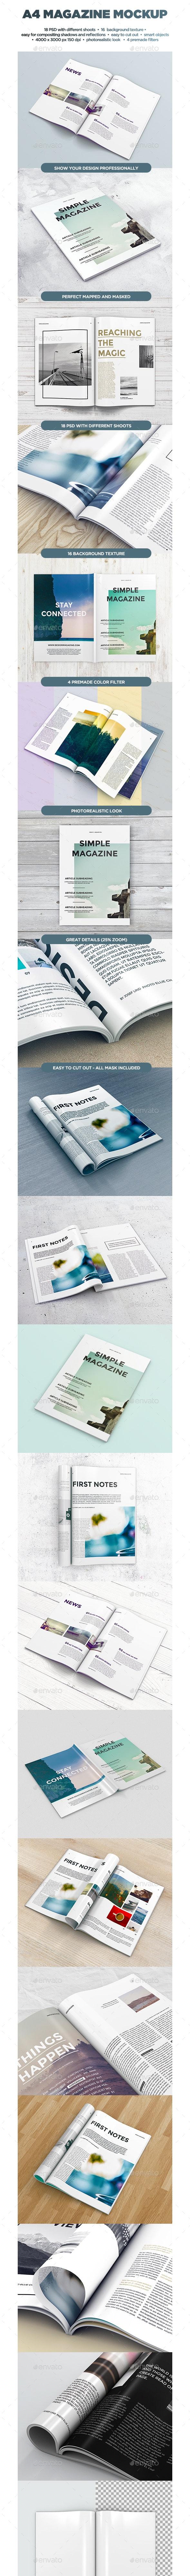 A4 Magazine MockUp vol.2 - Magazines Print